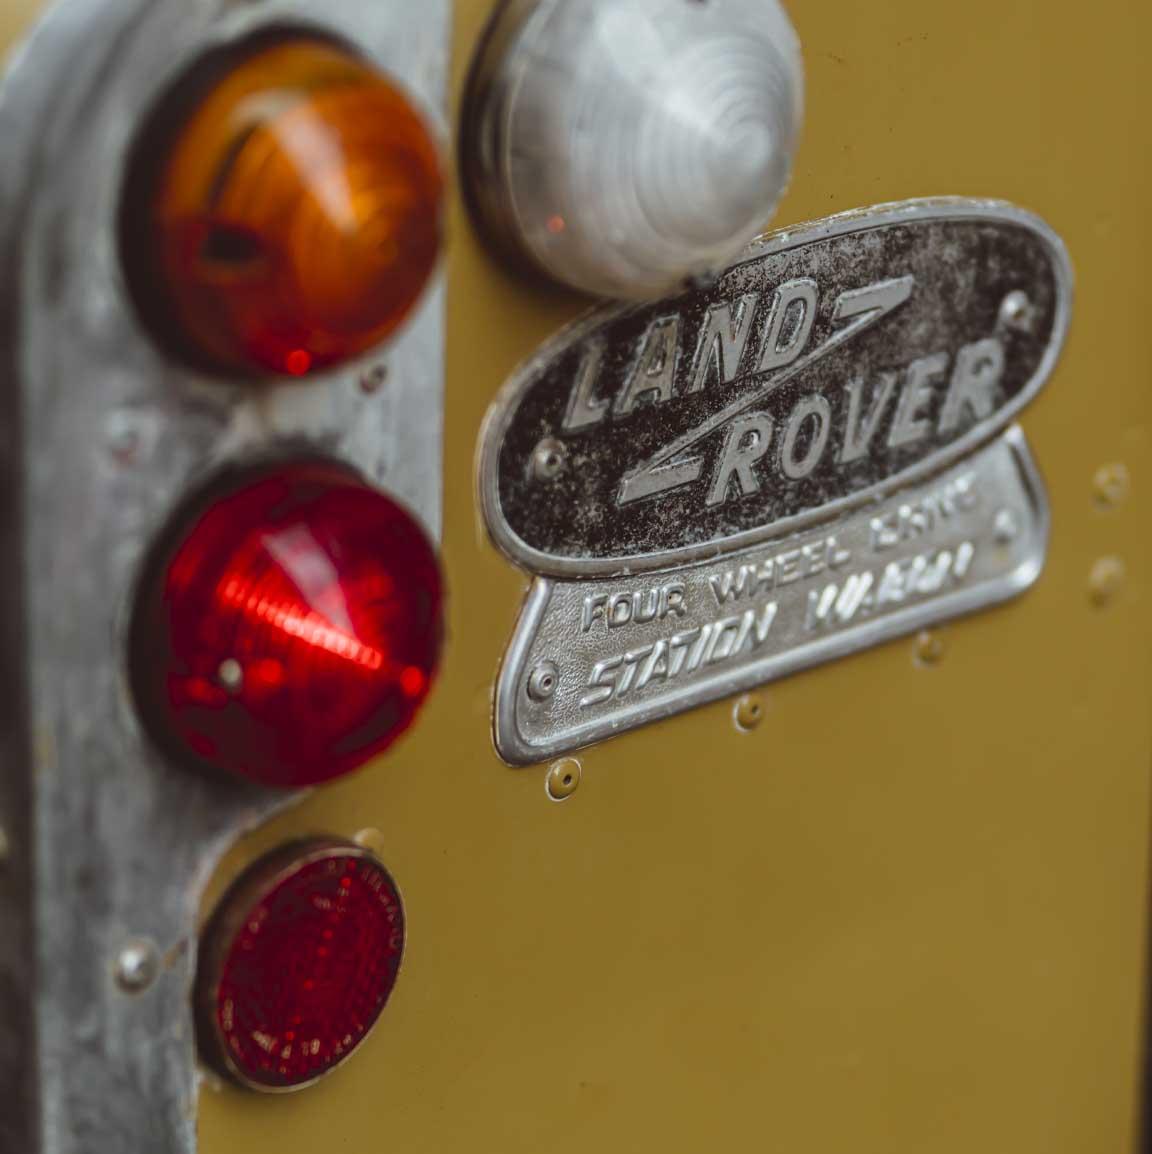 1975_Land_Rover_Series_III_109_Bahama_Gold_Small_0016_Layer 54.jpg